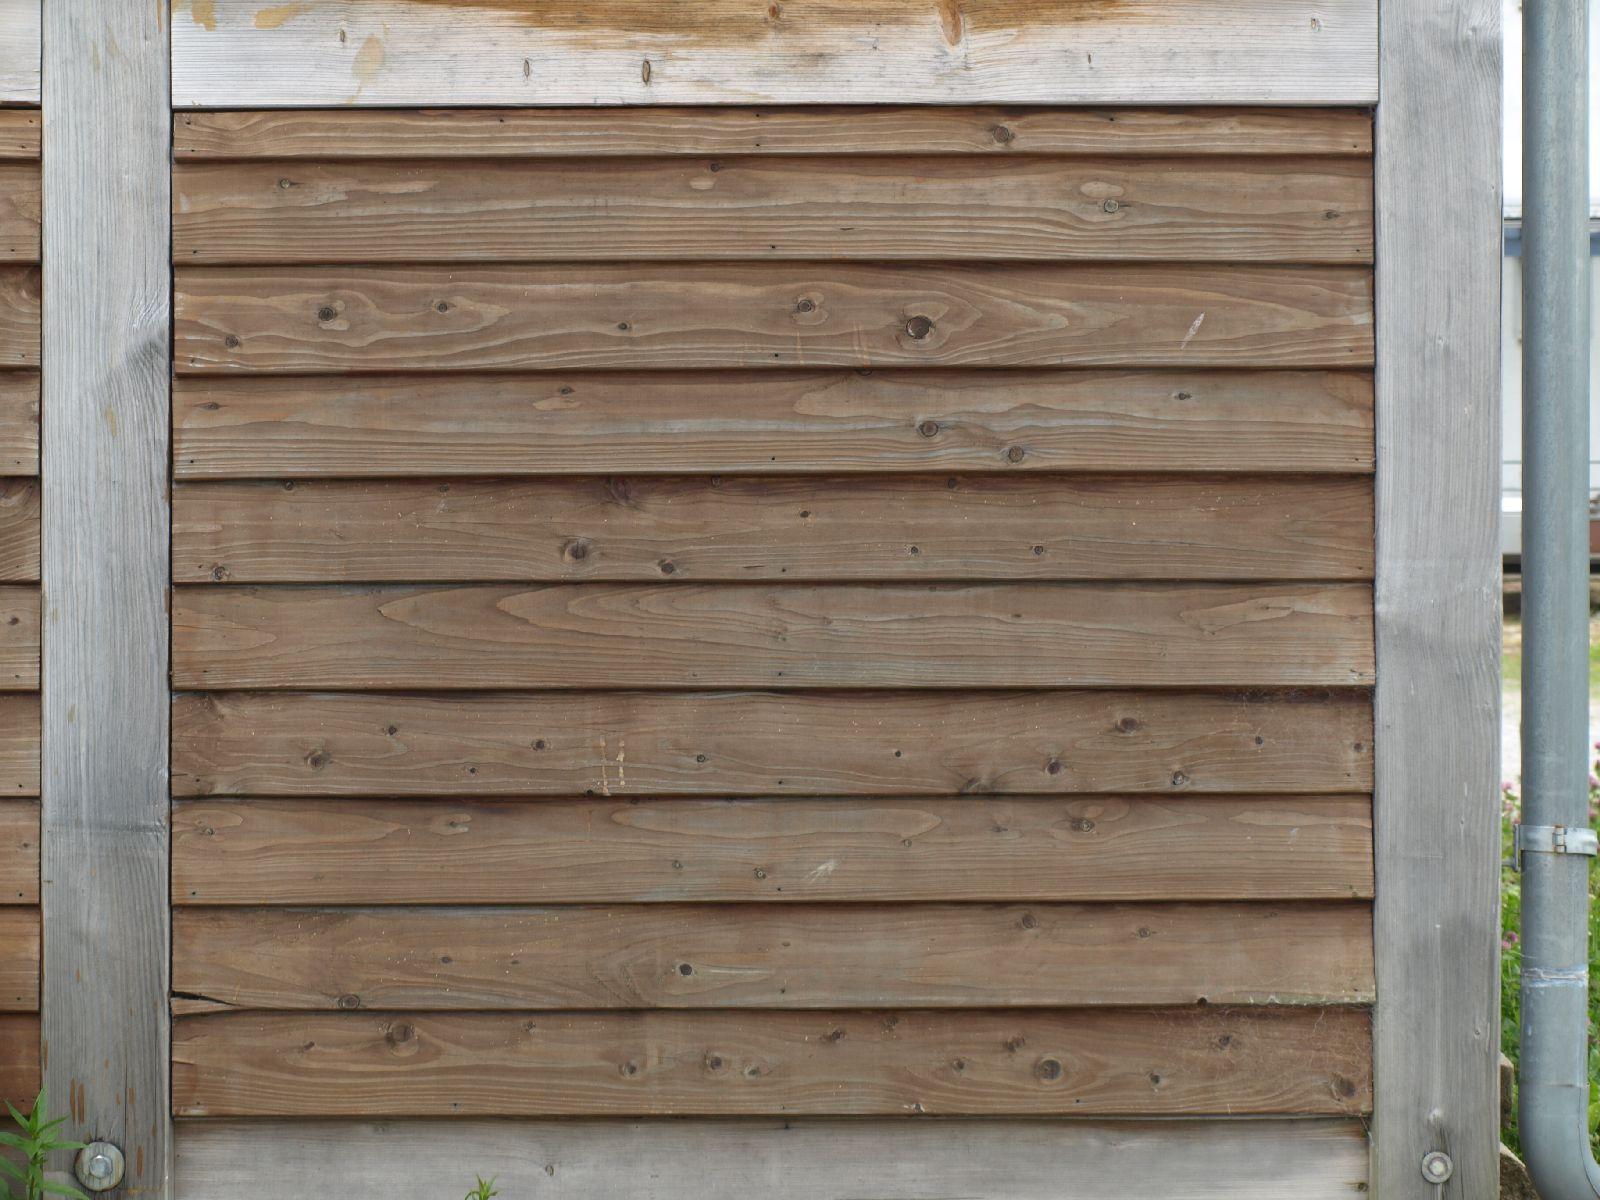 Wood_Texture_A_P5315706